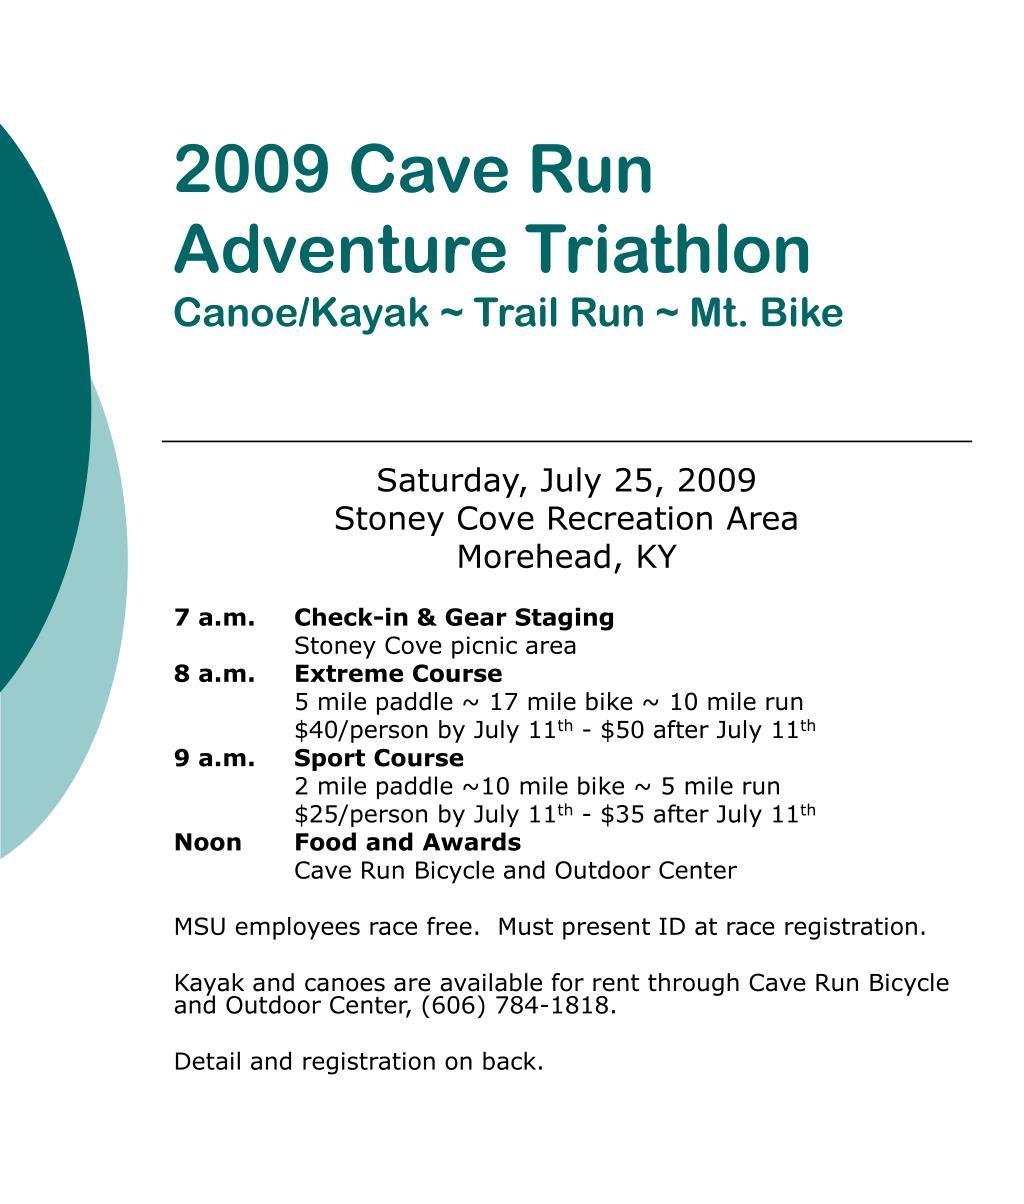 2009 cave run adventure triathlon canoe kayak trail run mt bike l.